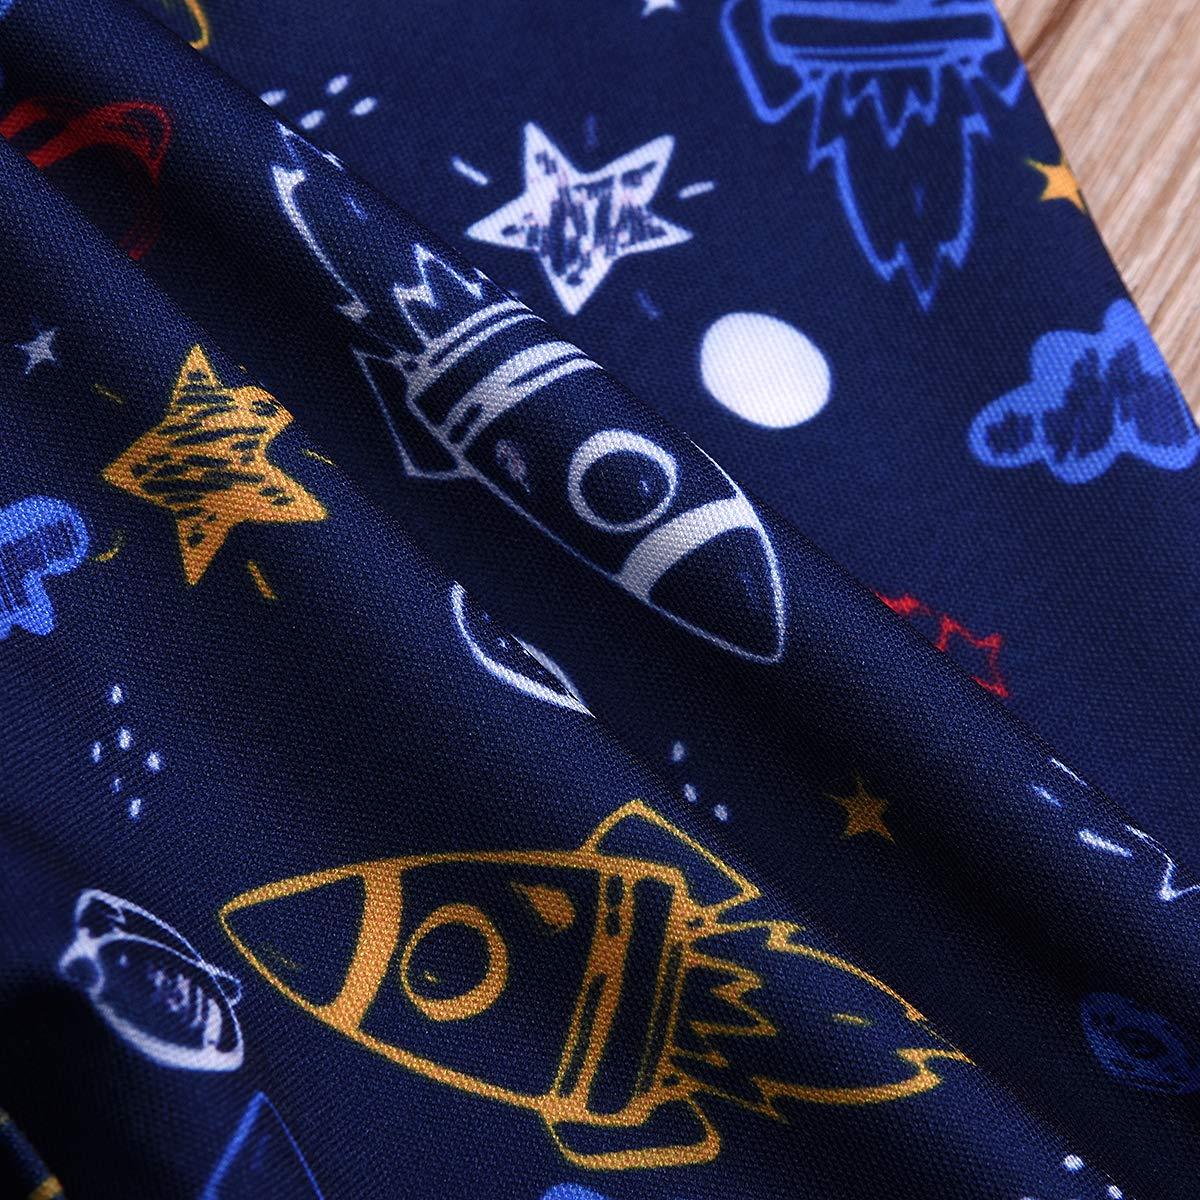 MAFAGE Newborn Baby Boys 3PCS Outfit Set Star Moon Romper Bodysuits Top Long Pants Hat Set Clothes